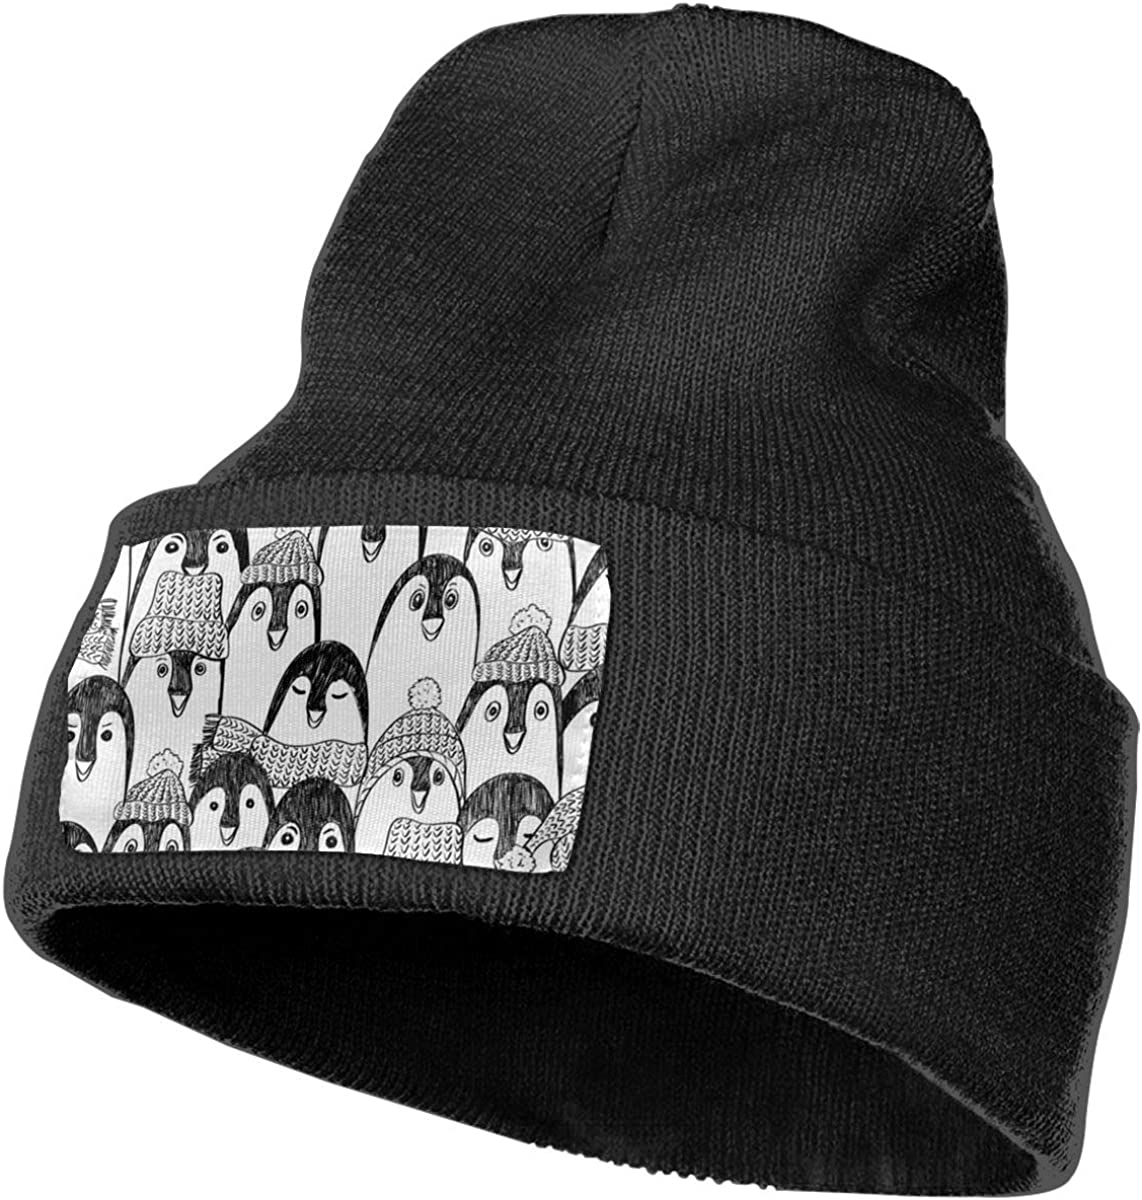 Cartoon Penguin Mens Womens Stylish Kintted Beanie Hat Slouchy Chunky Cuff Beanie